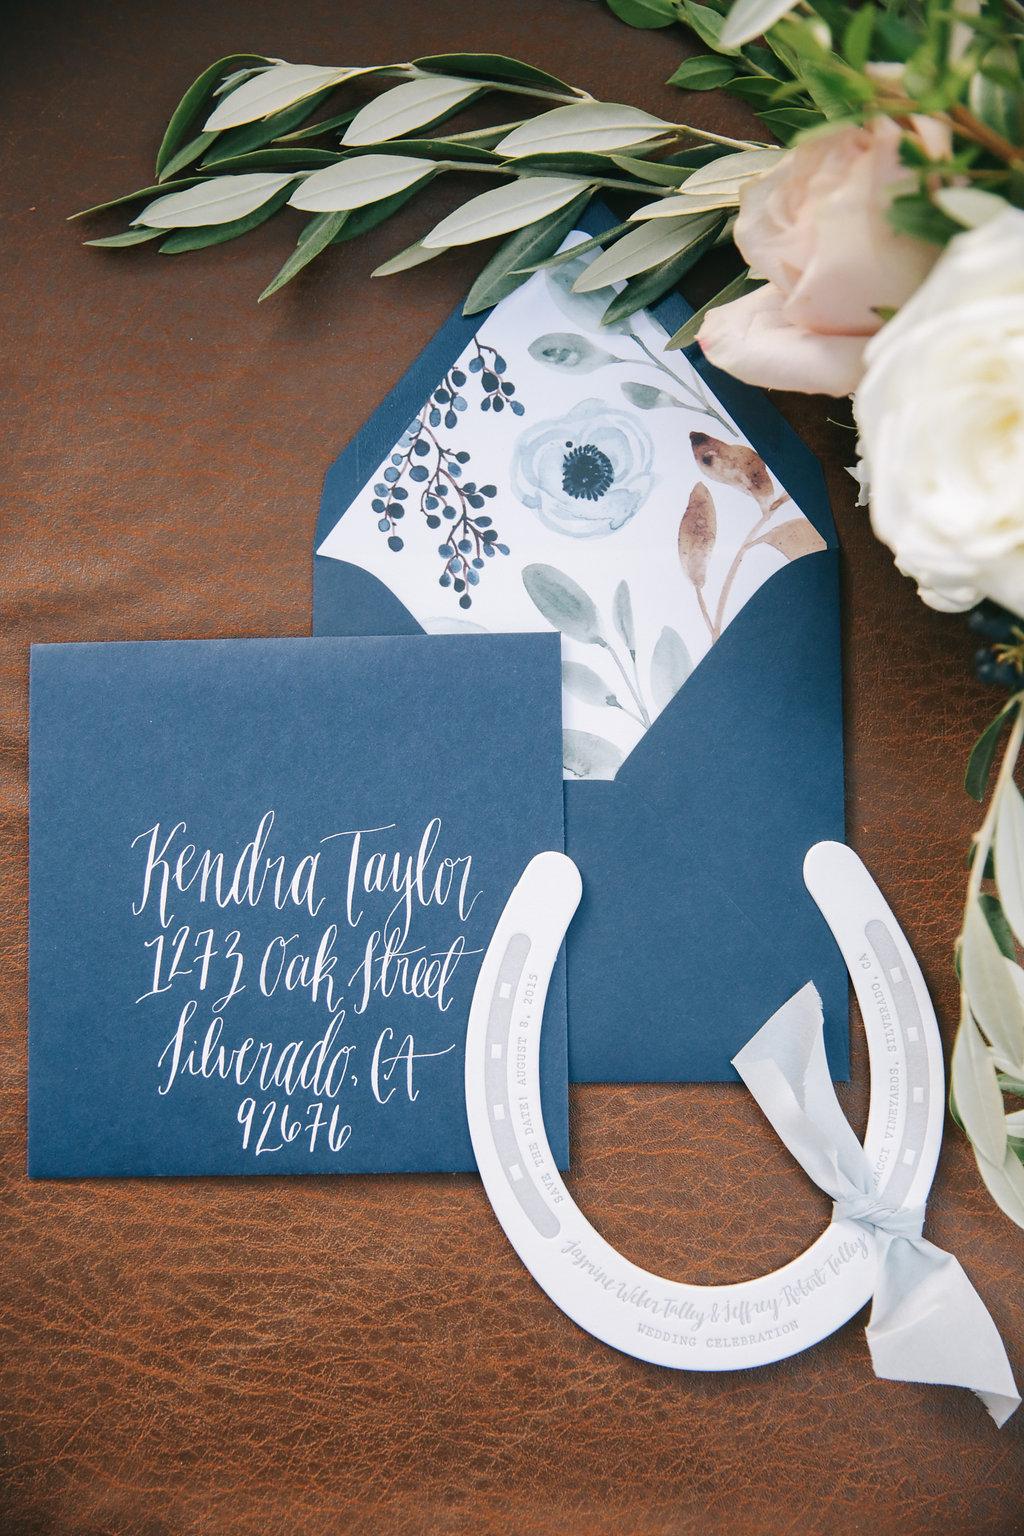 LVL+Weddings+and+Events+Brandon+Kidd+Equestrian+Wedding+(71).jpg